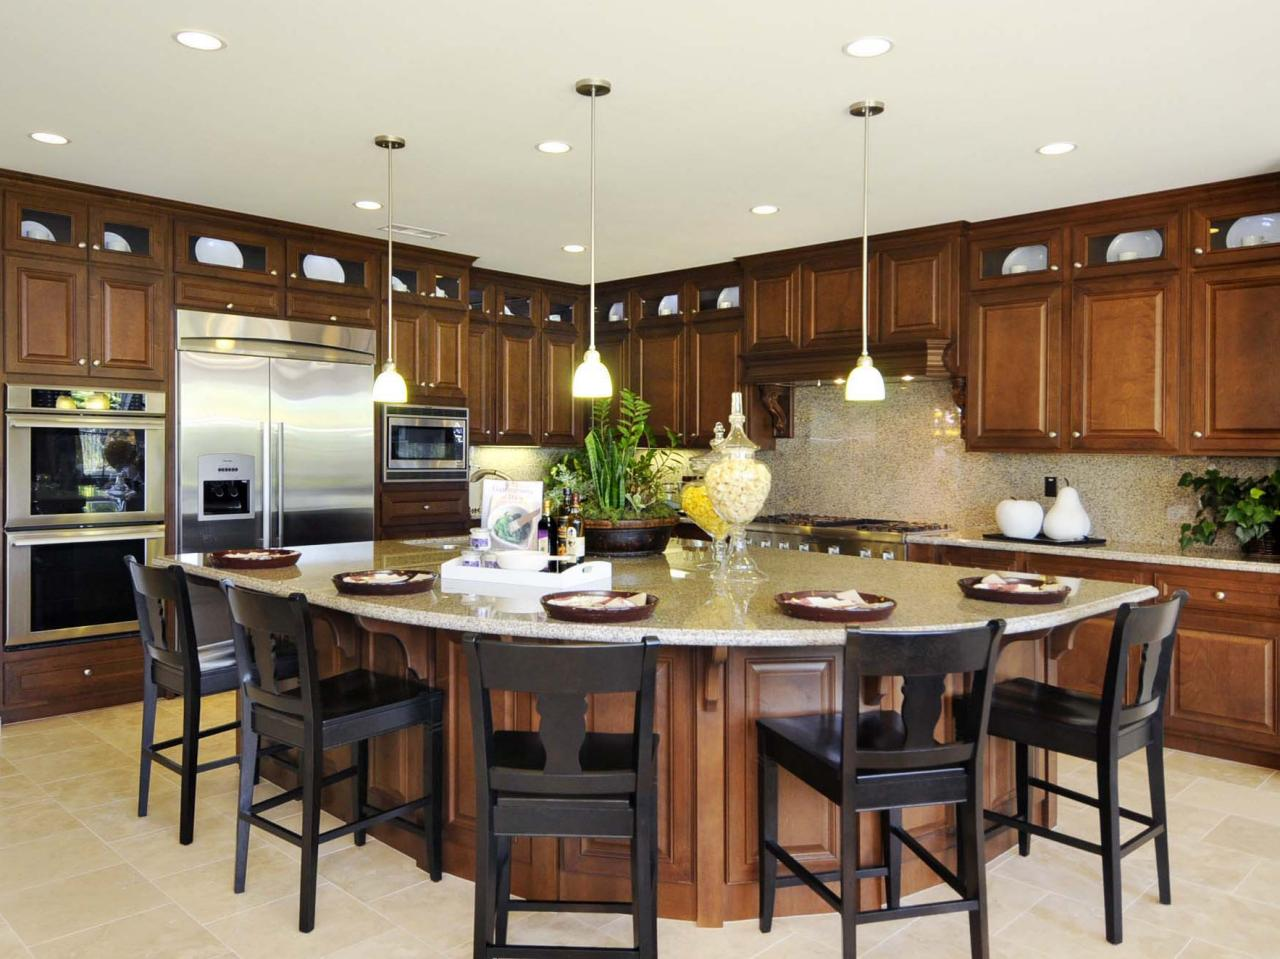 kitchen island design ideas DPTXPWY